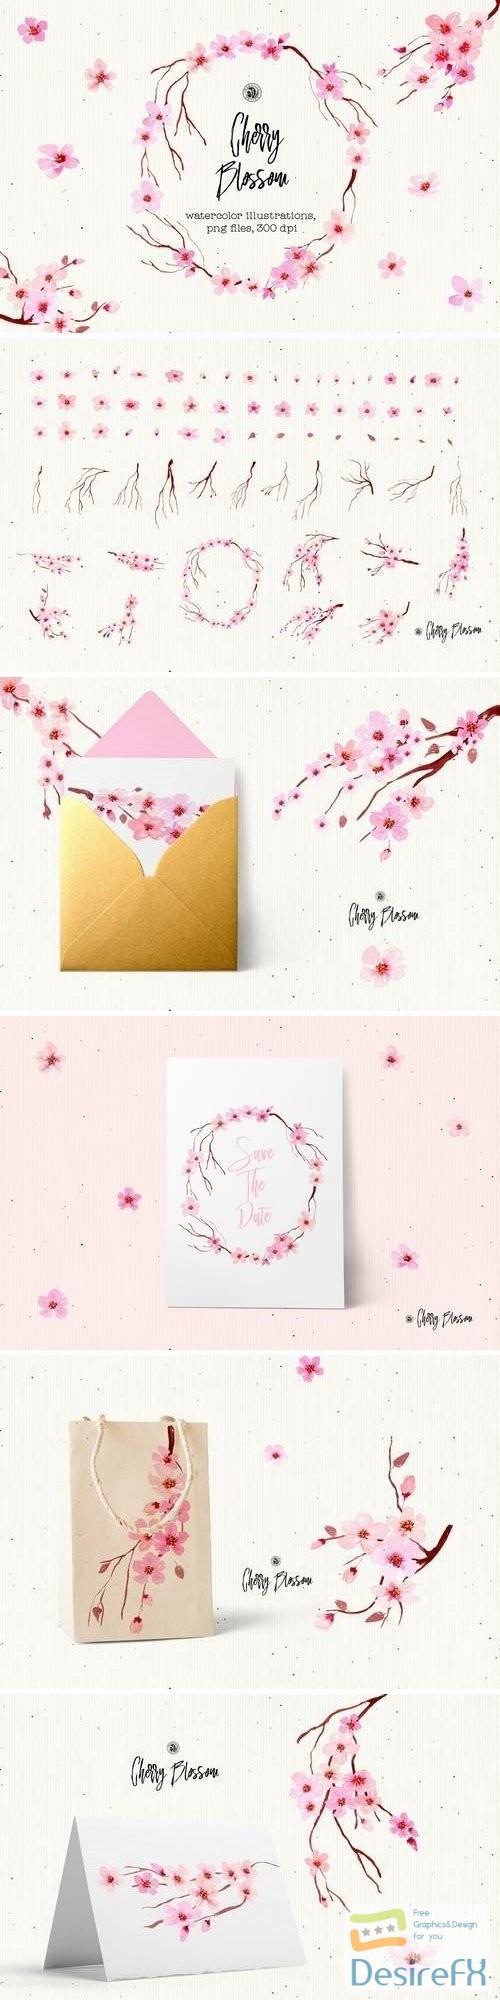 photoshop - Cherry Blossom Flowers - 3461867